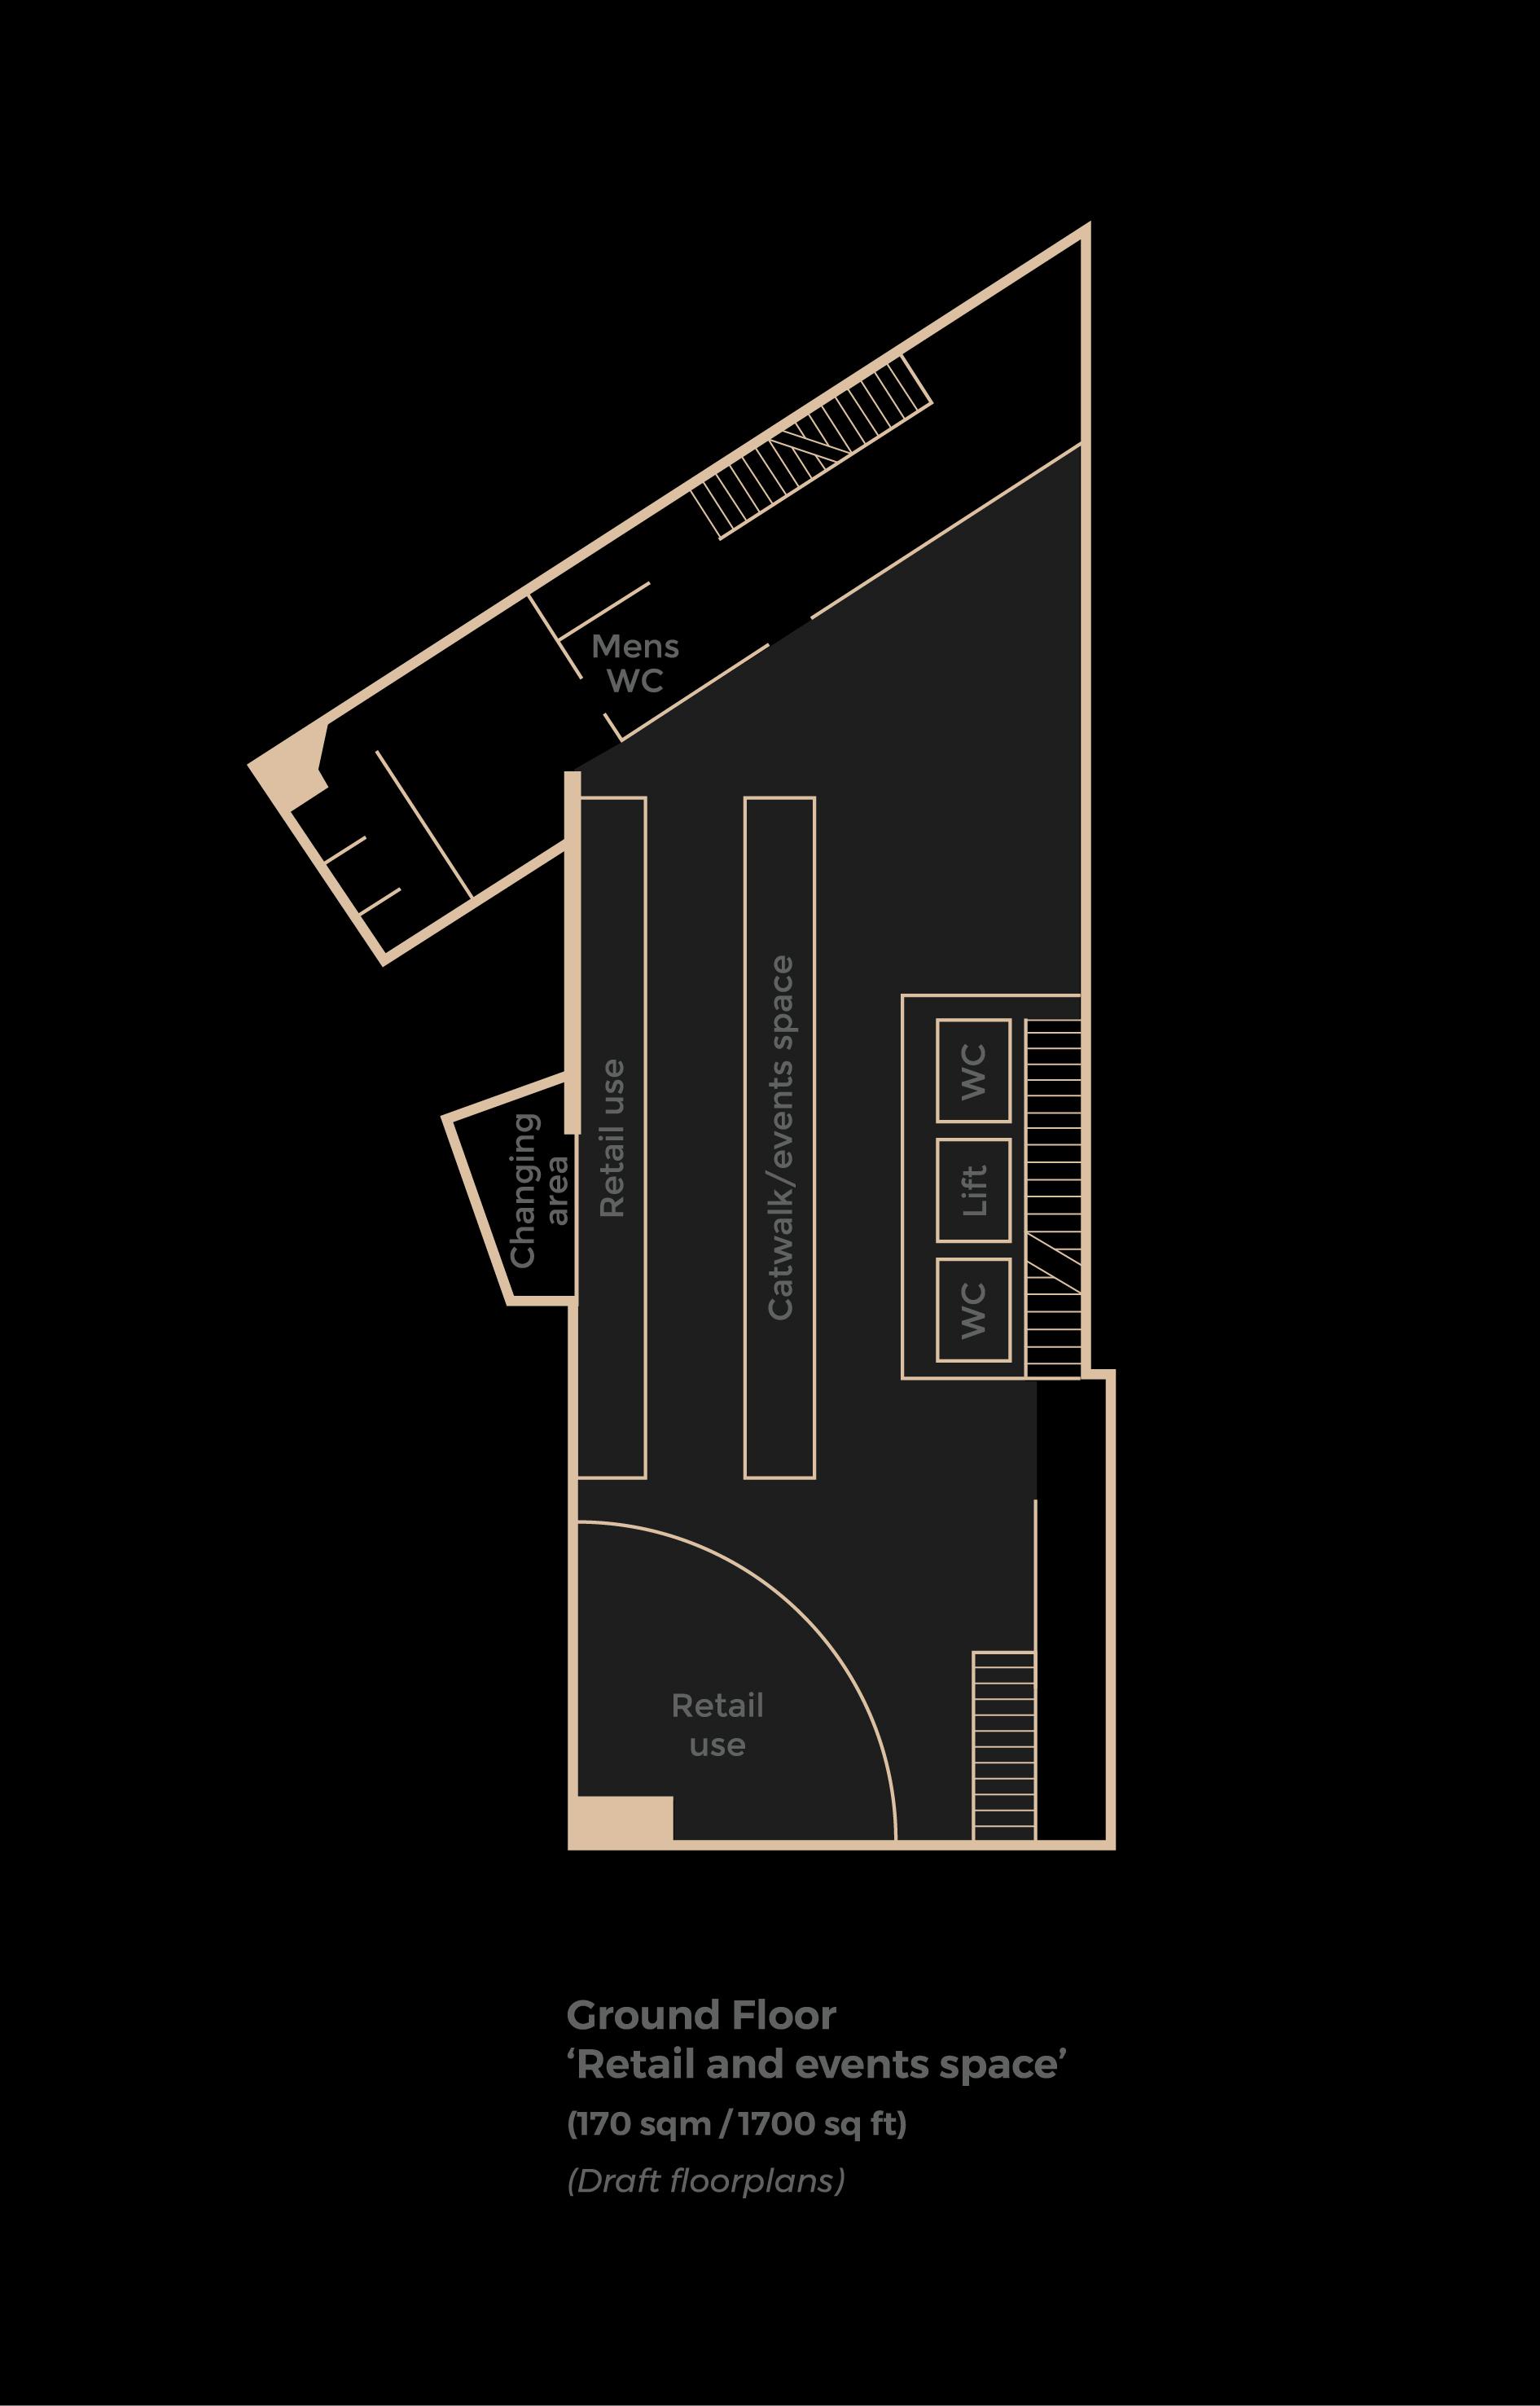 LTC001_Hat_House_Floorplans_black_outlined_V3-02.jpg